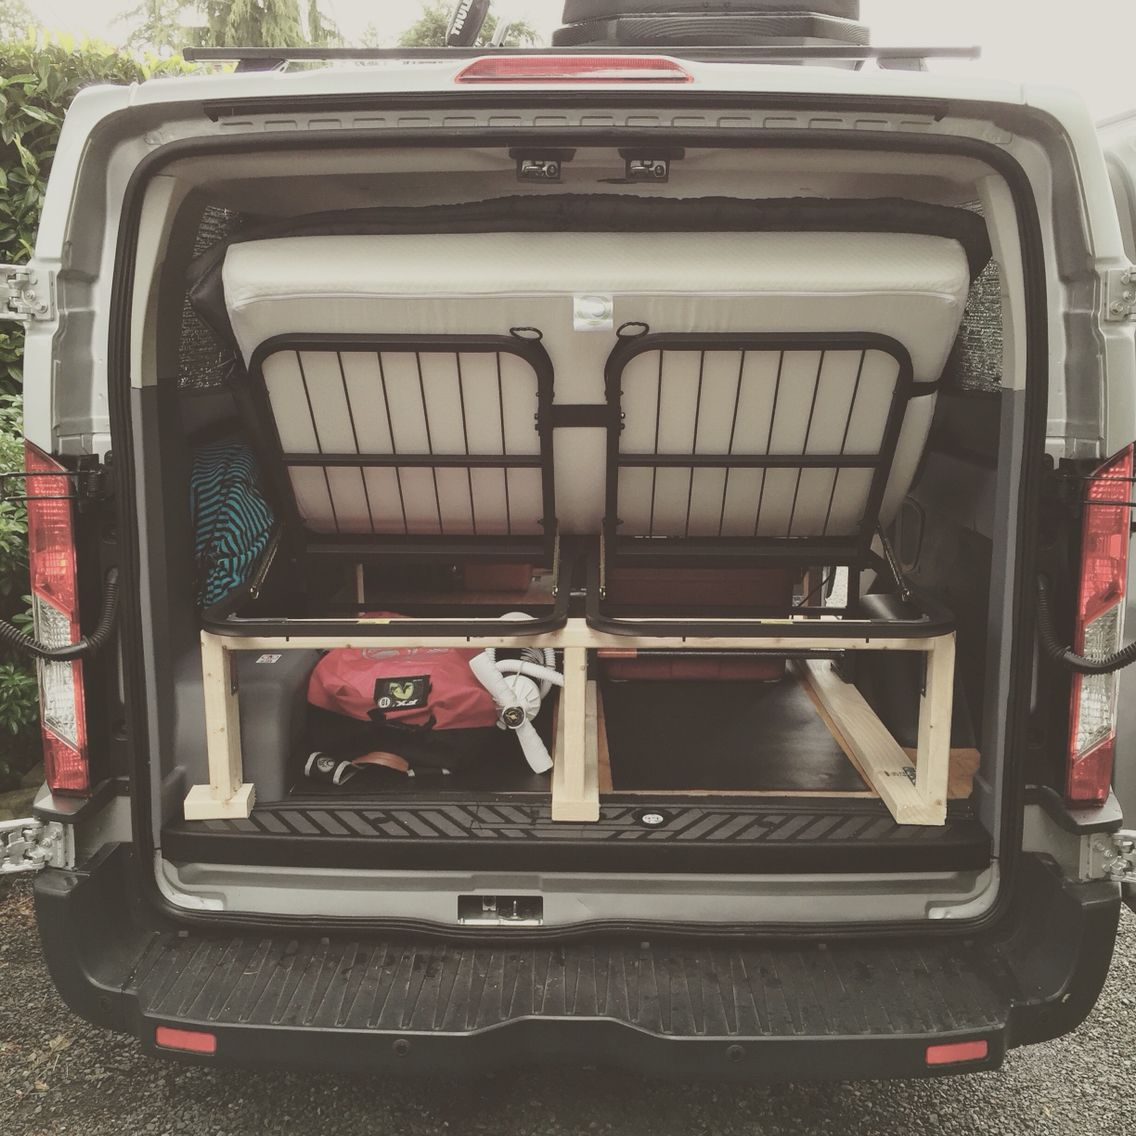 pragmabed adjustable full size bed installed in a ford transit camper conversion